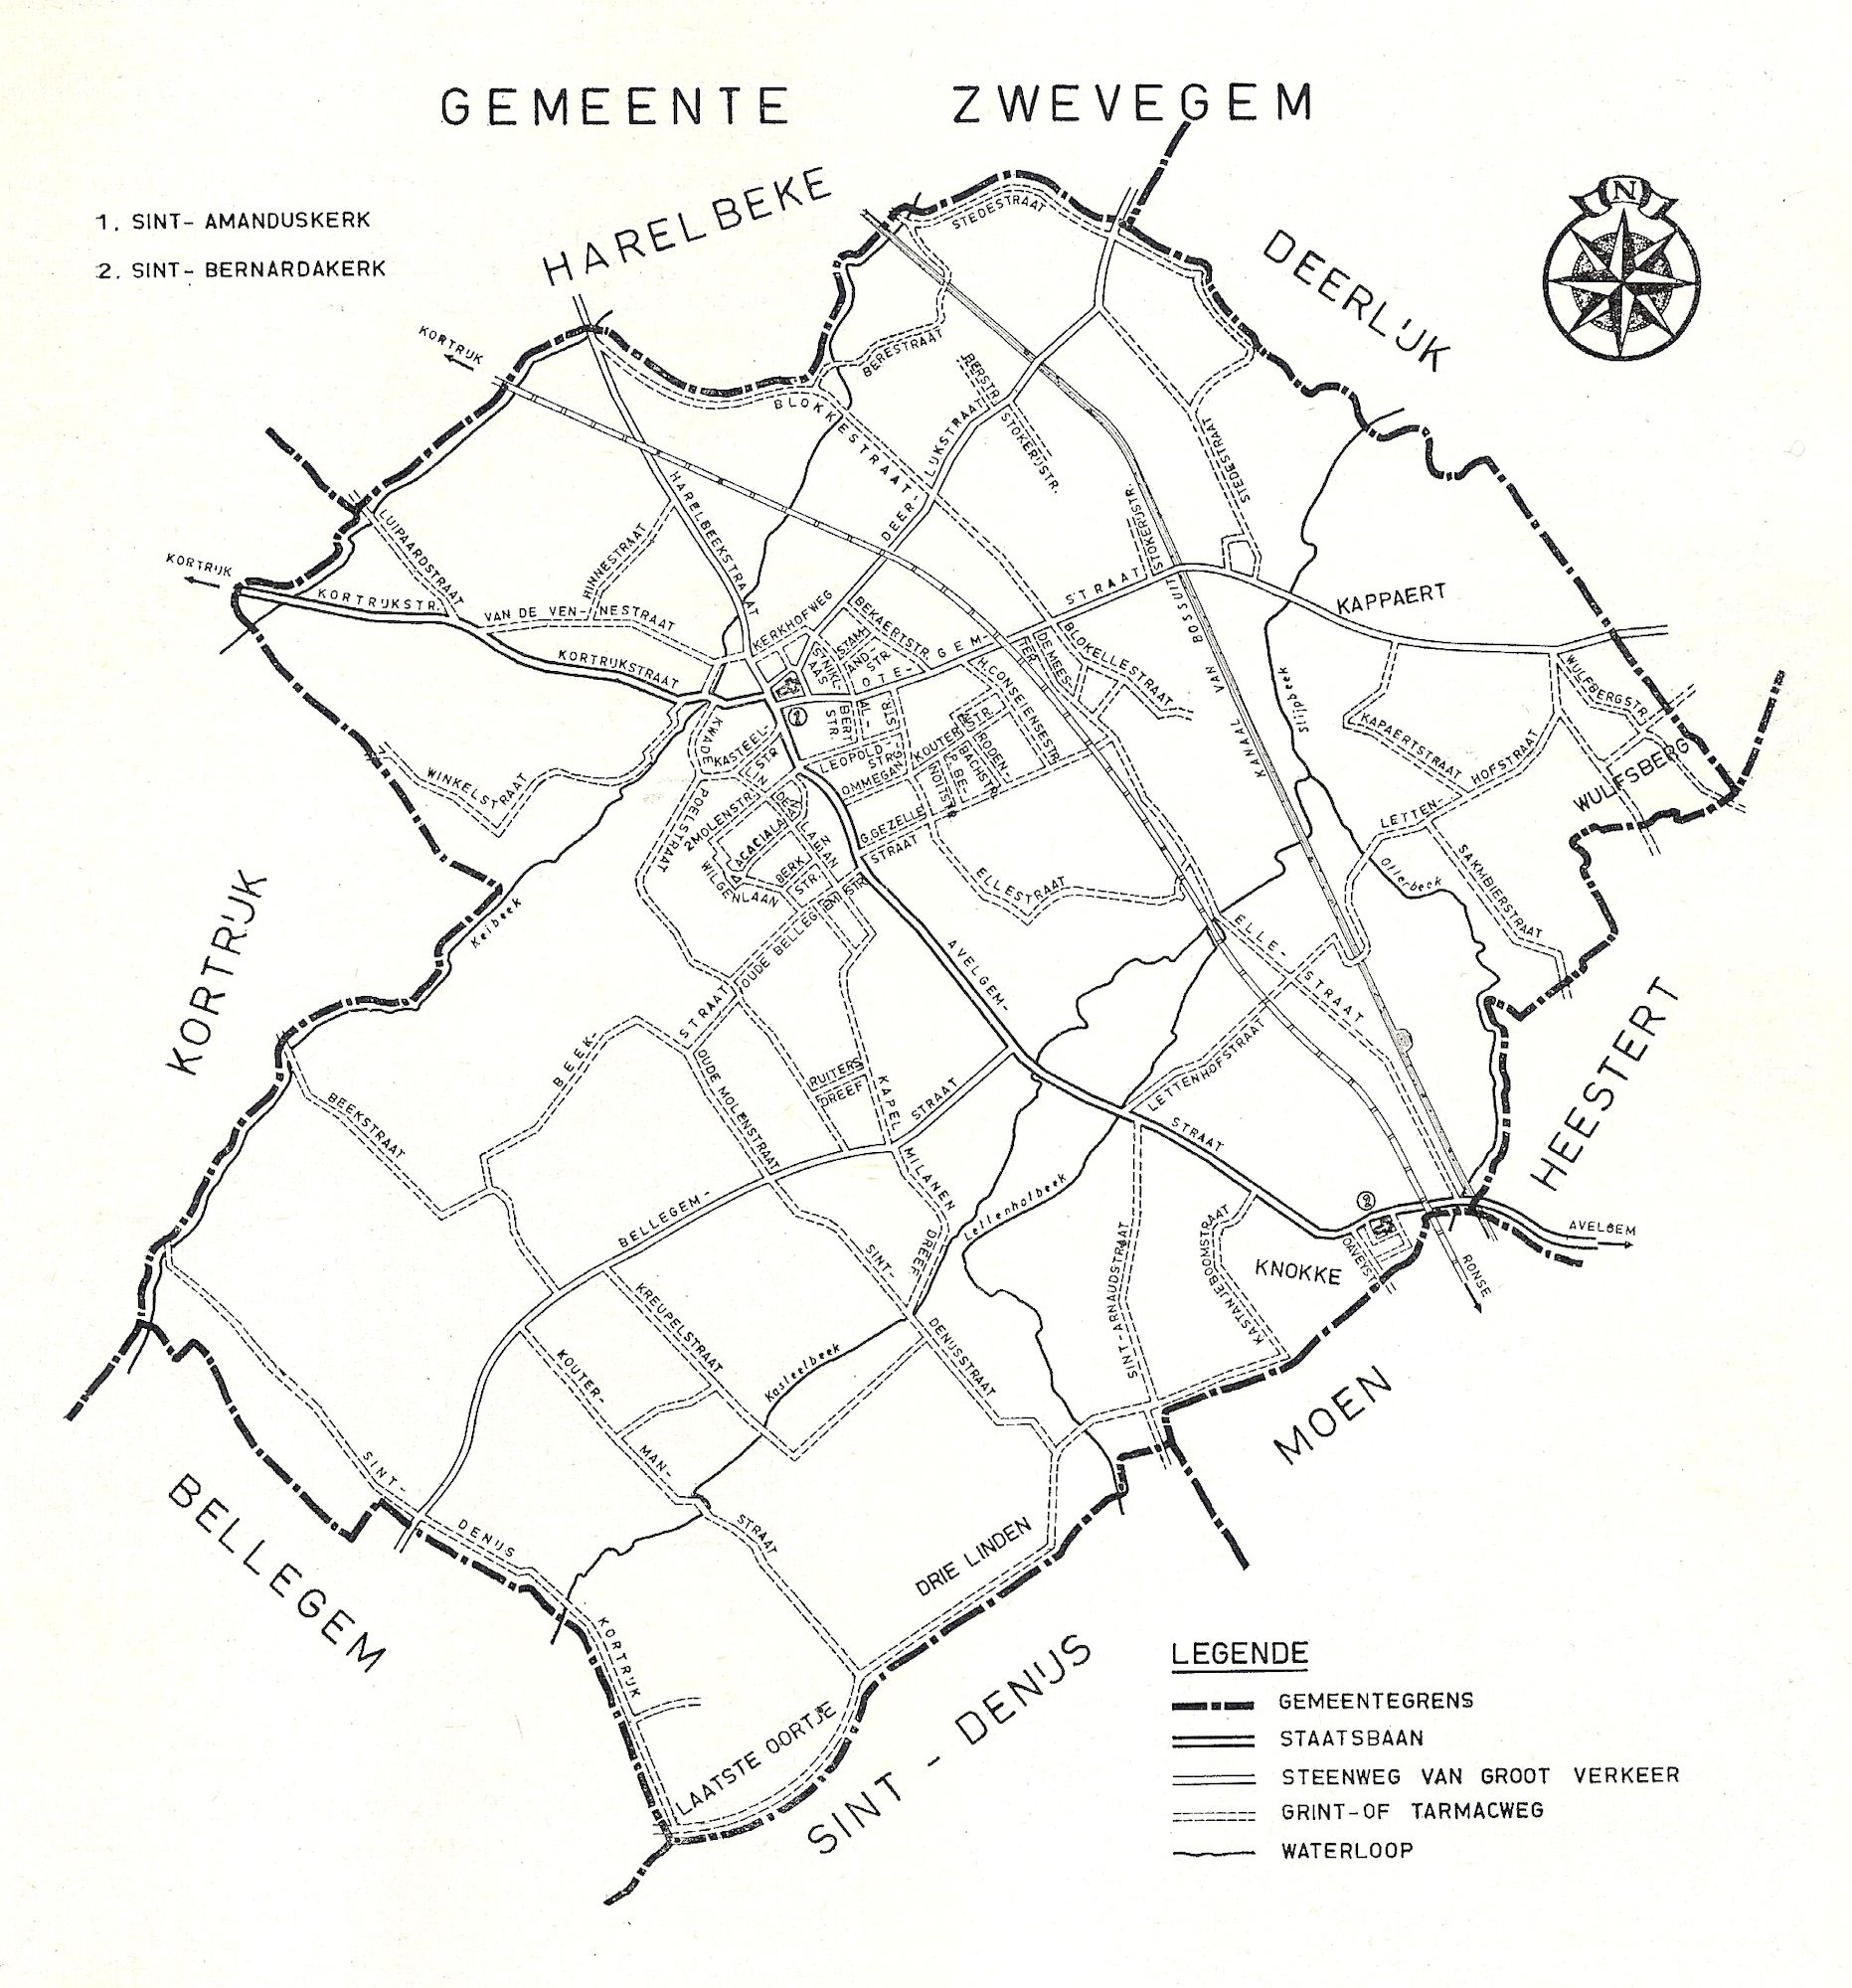 Grondplan gemeente Zwevegem